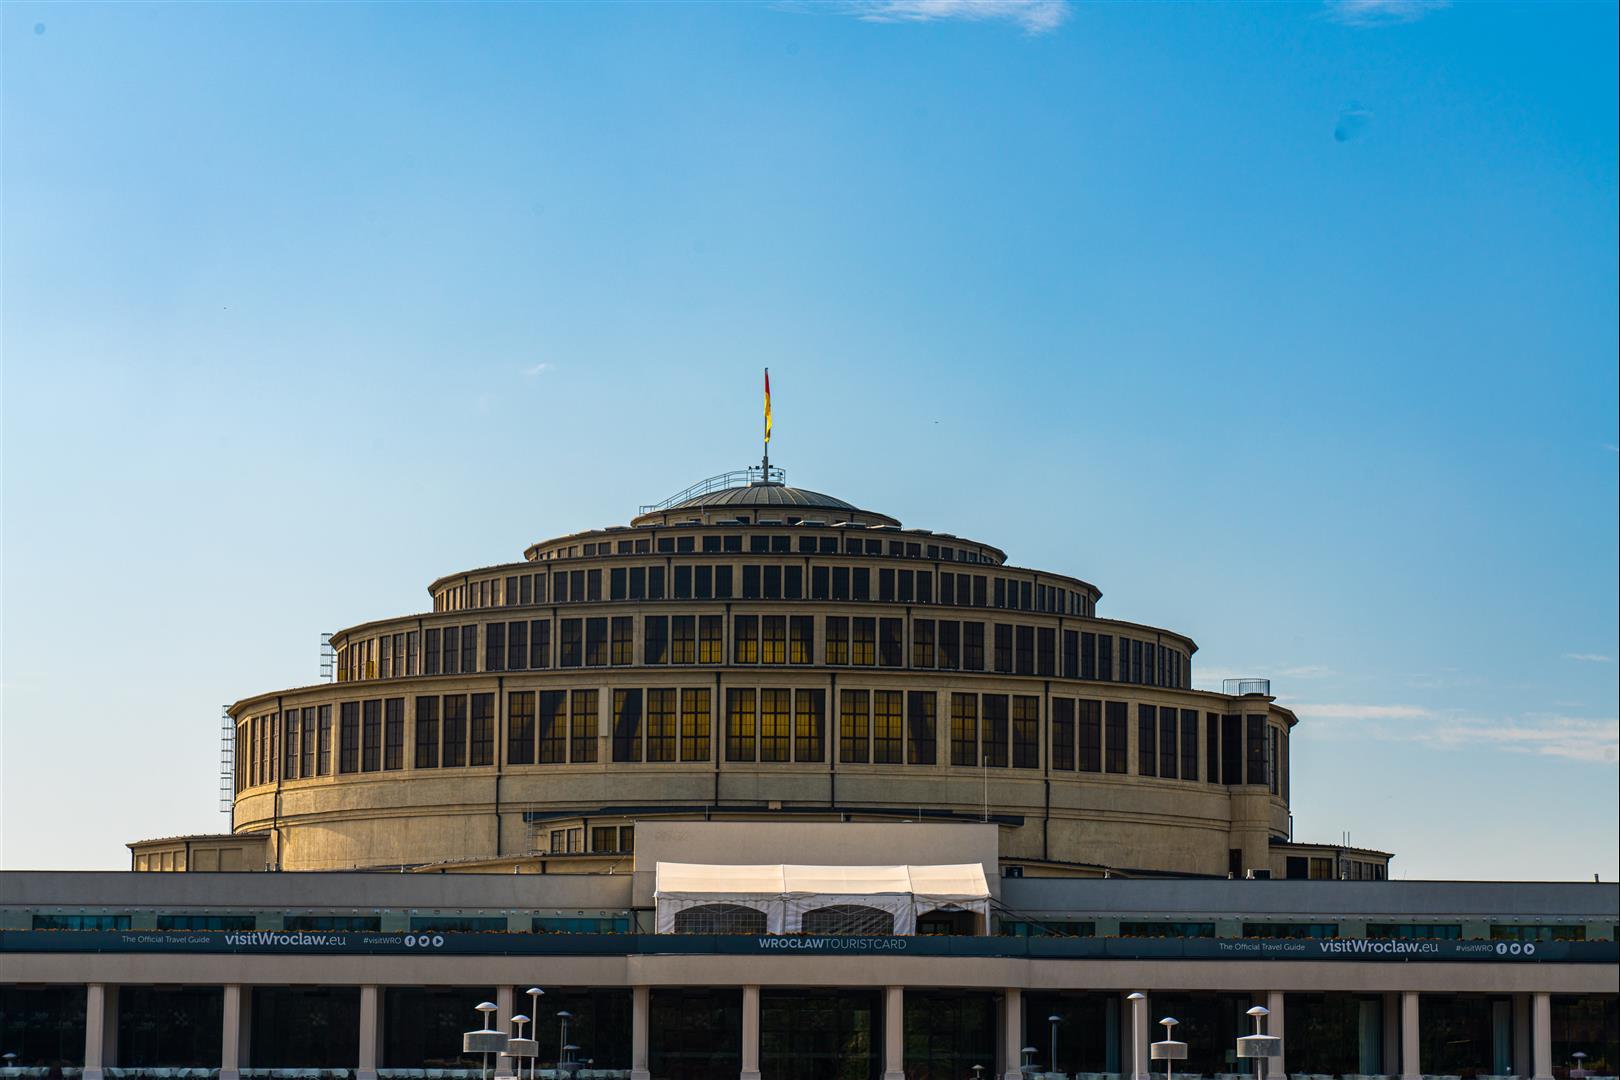 百年廳 Centennial Hall